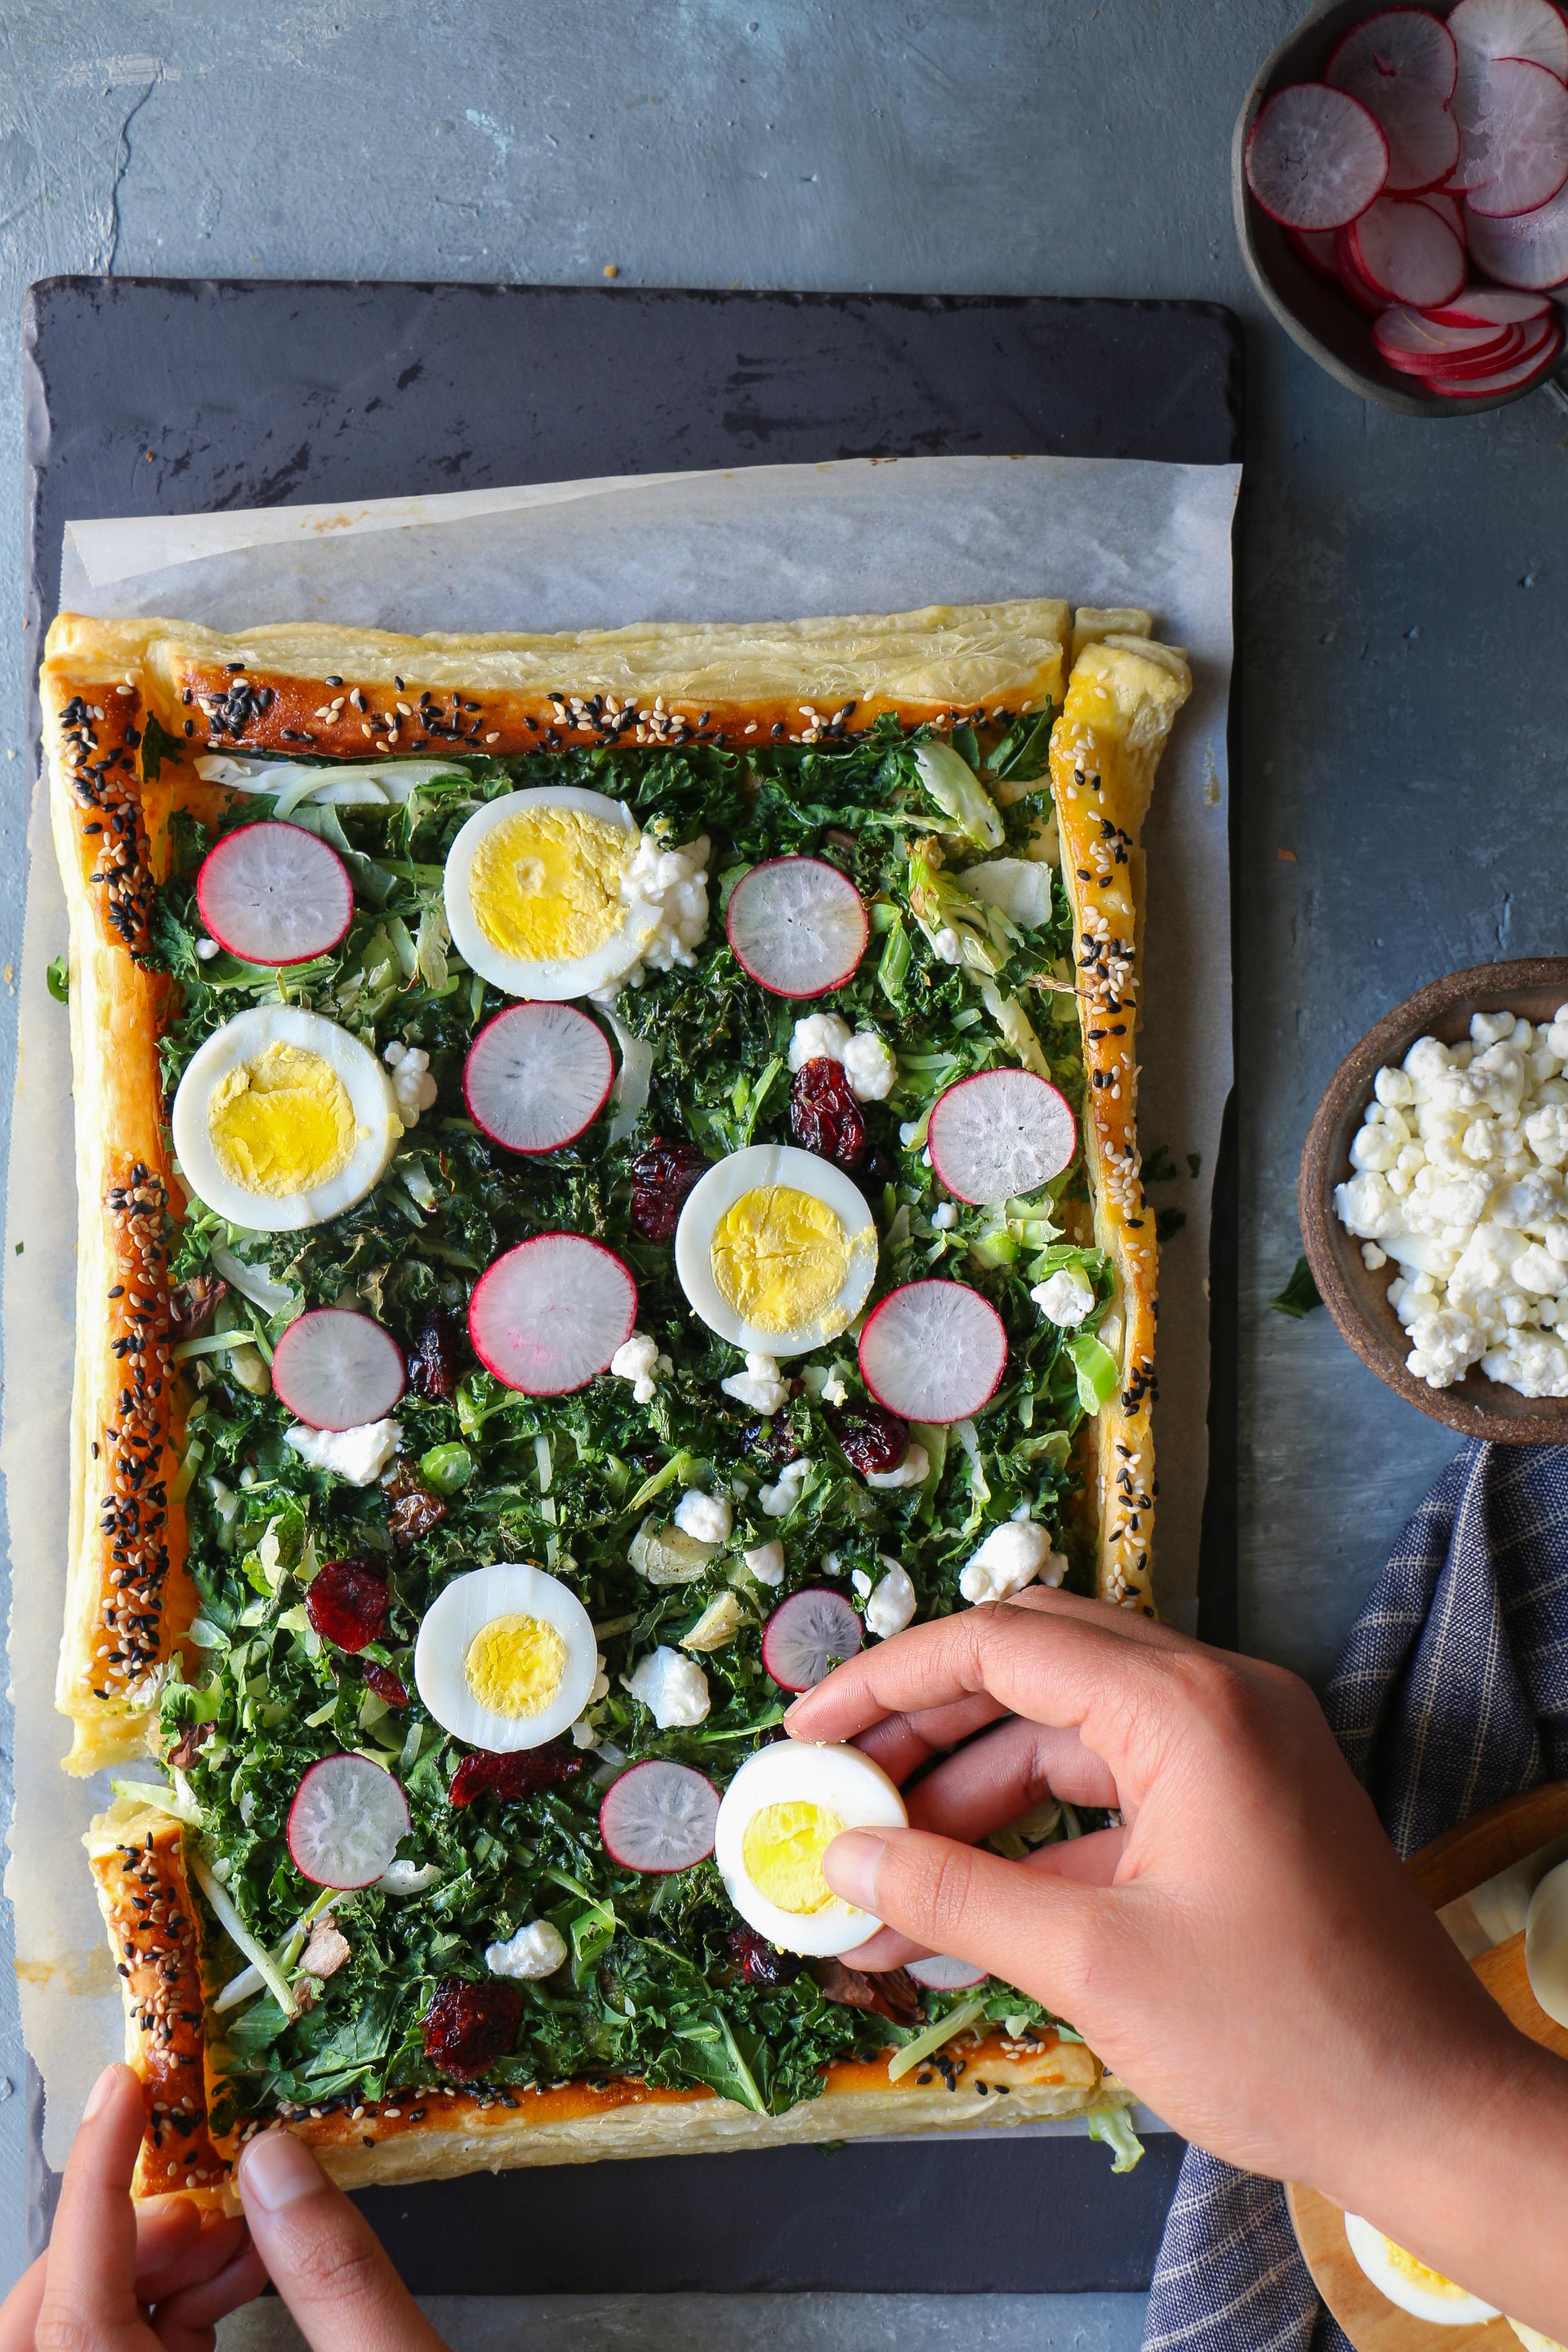 Rustic Spring Sweet Kale and Egg Tart |foodfashionparty| #sweetkaletart #springtart